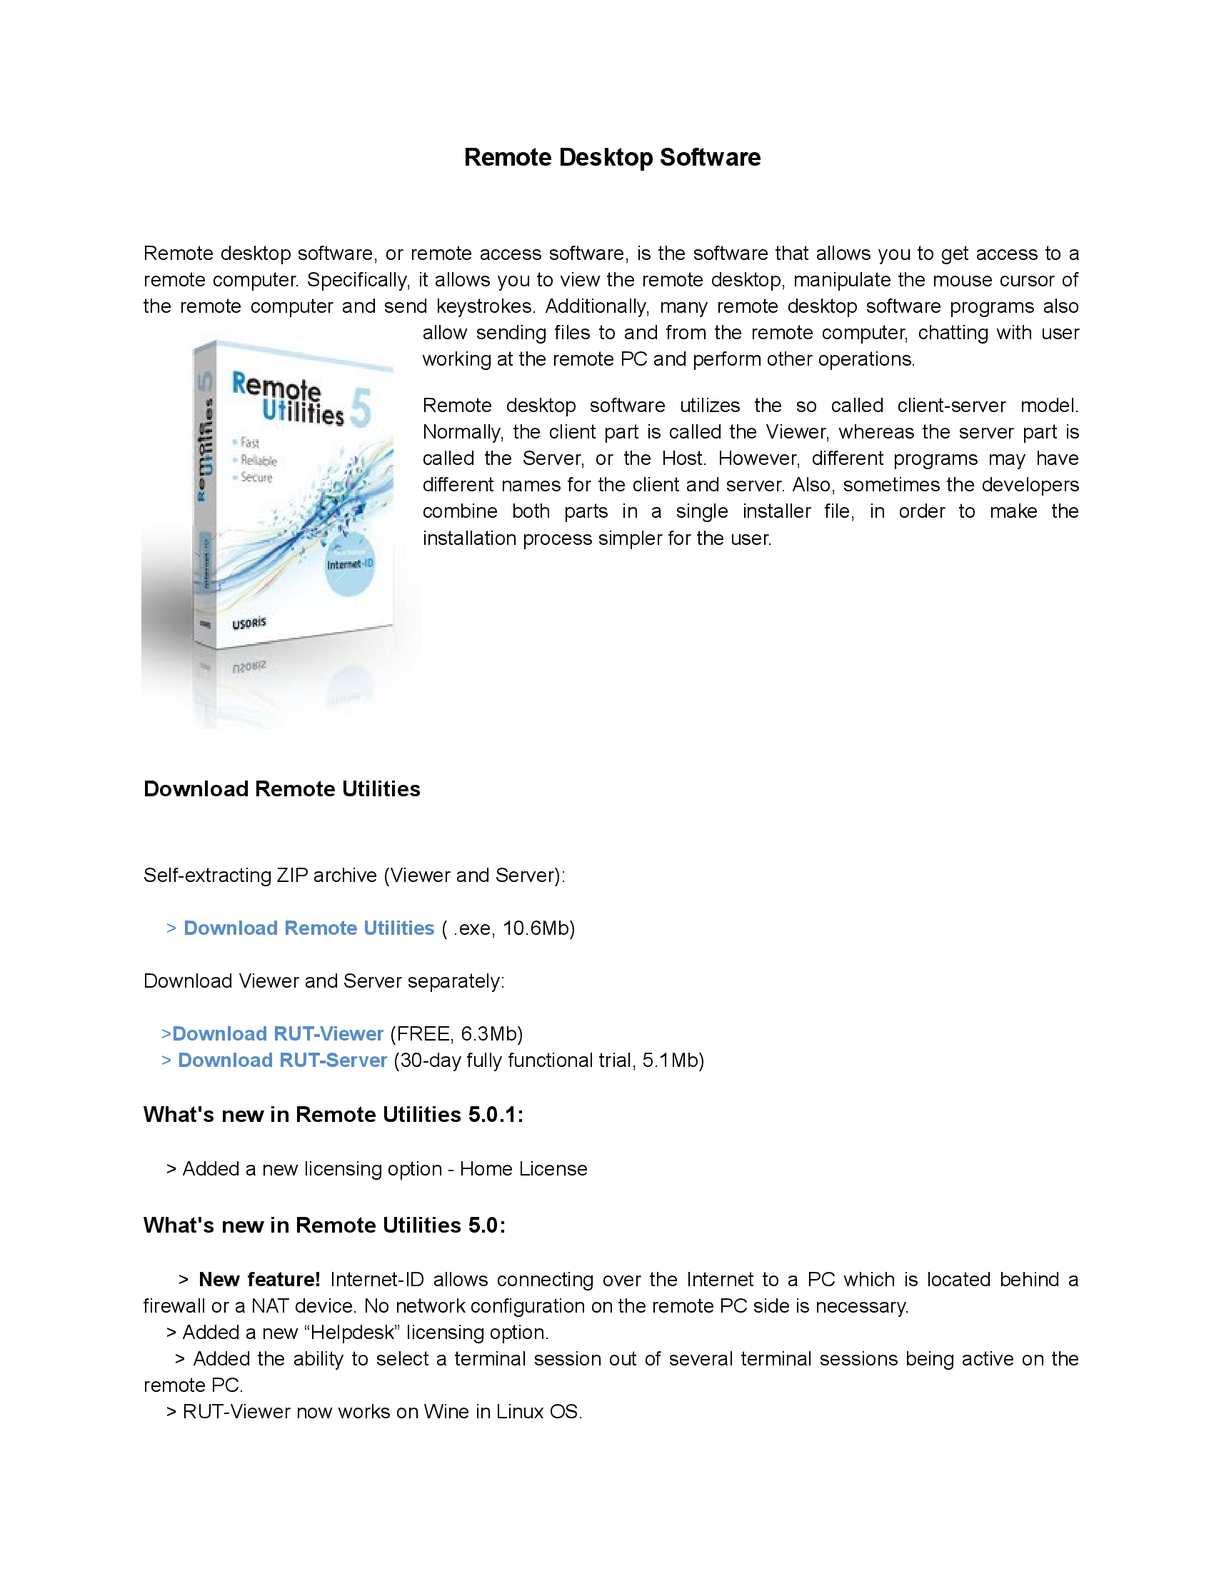 Calaméo - Remote Desktop Software